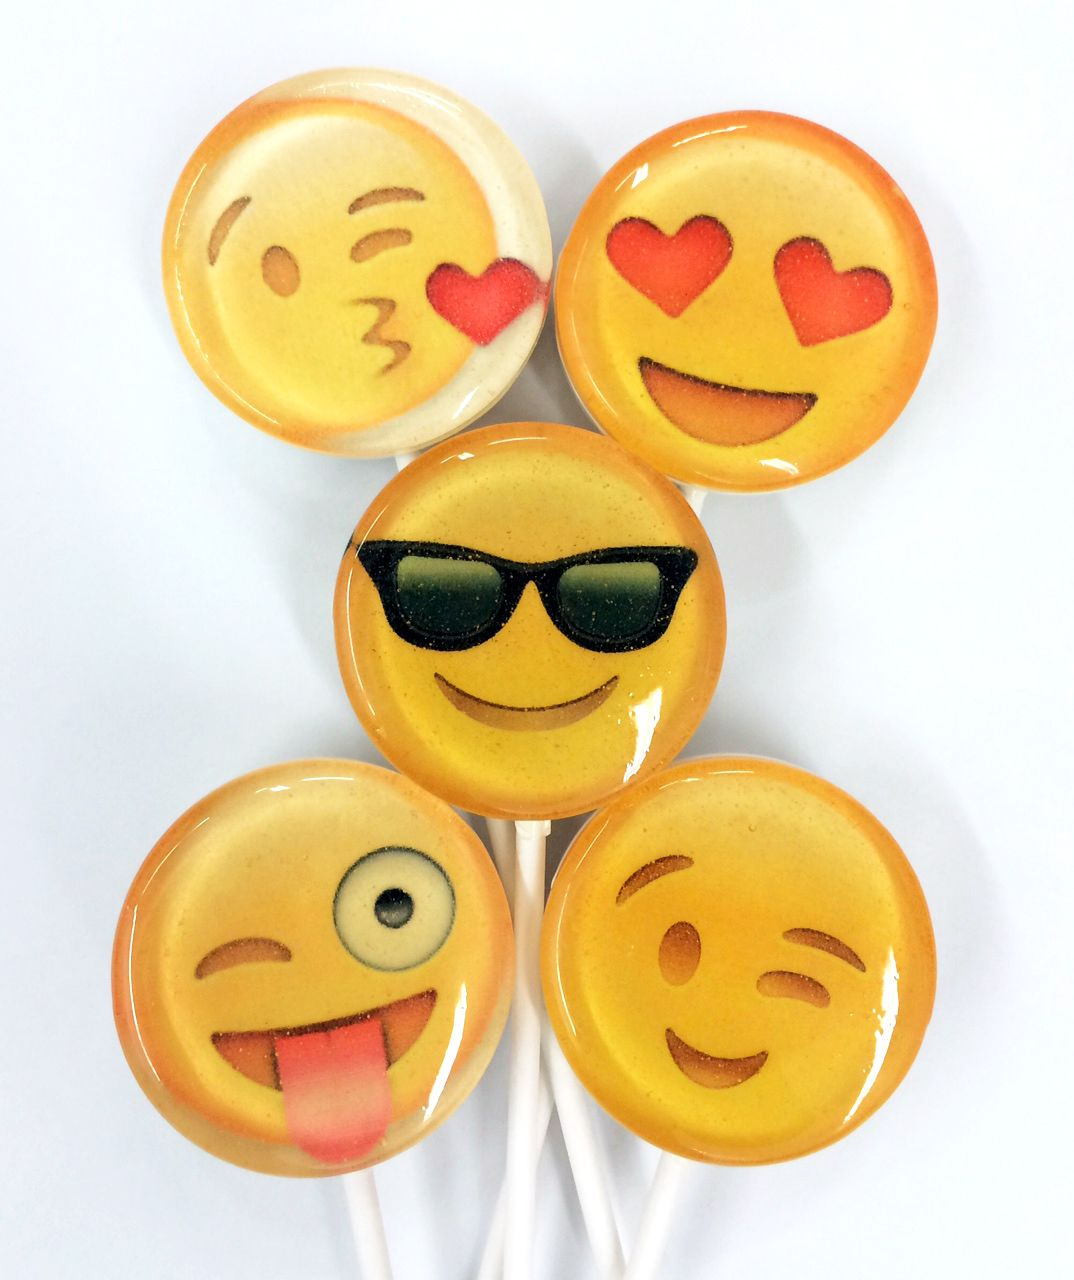 Emoji Lollipops Emoji Lollipop Lollipop Emoji Cookie